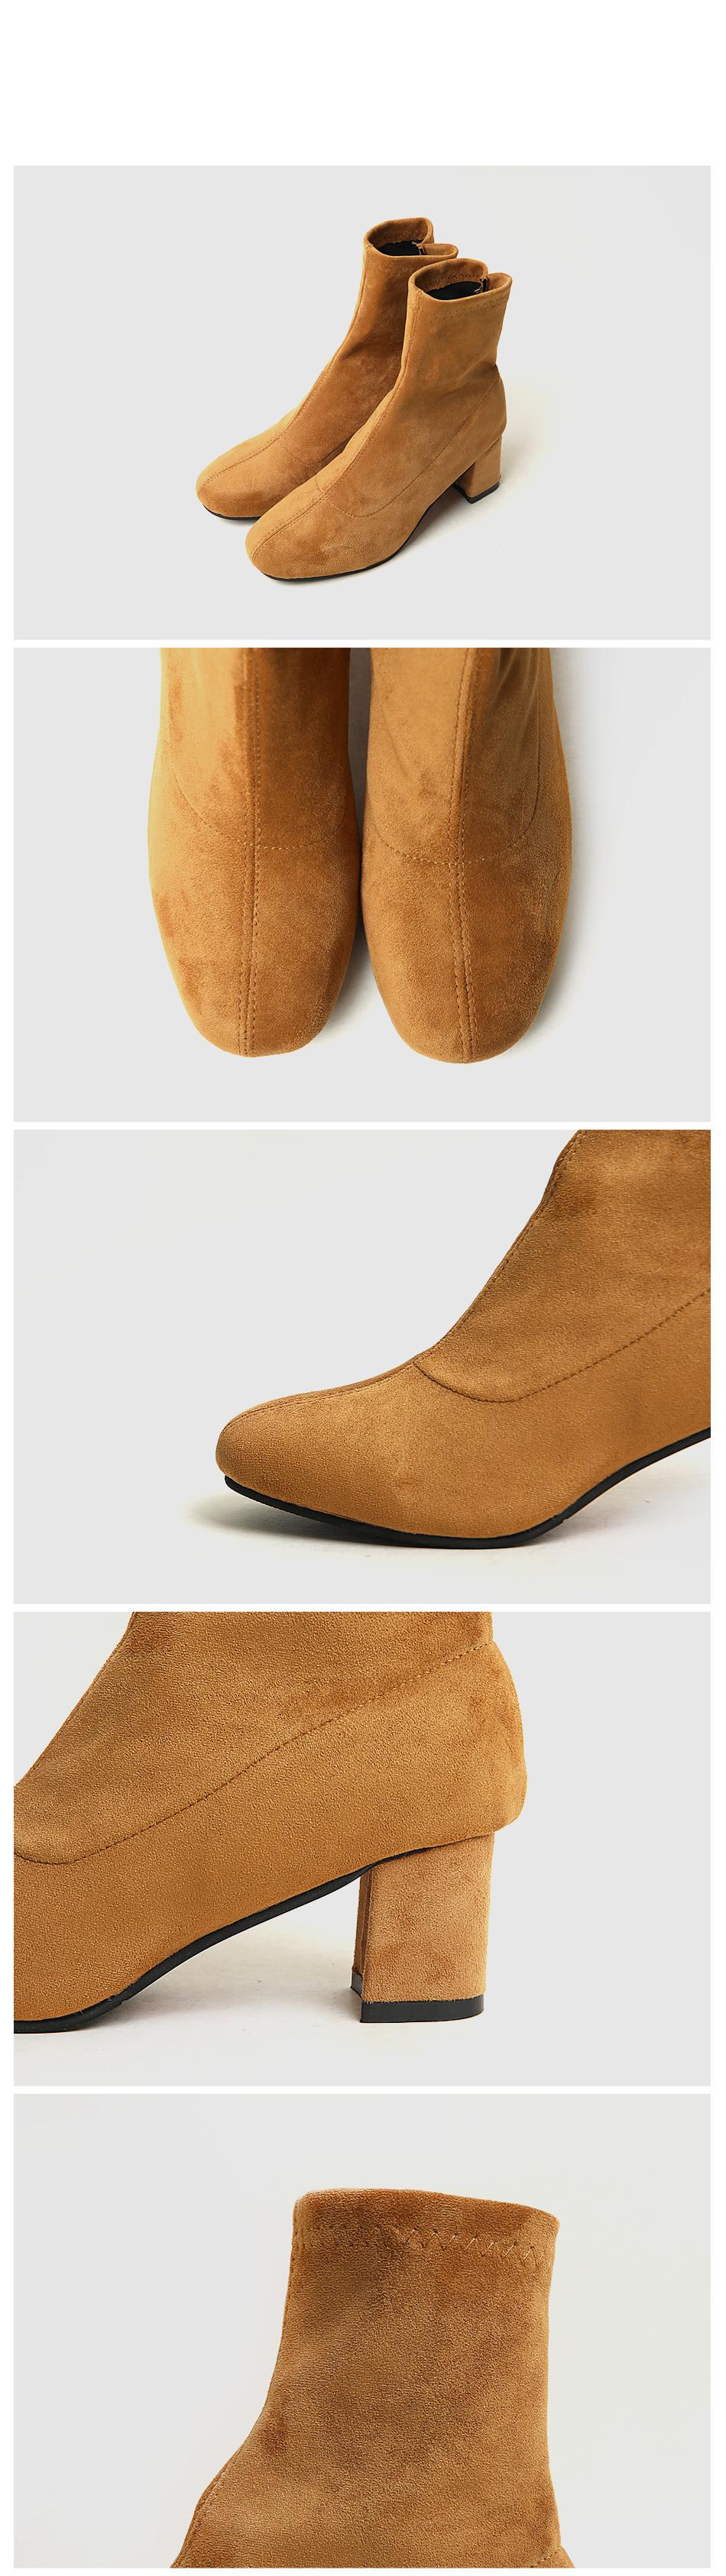 Ruelteen socks ankle boots 5cm